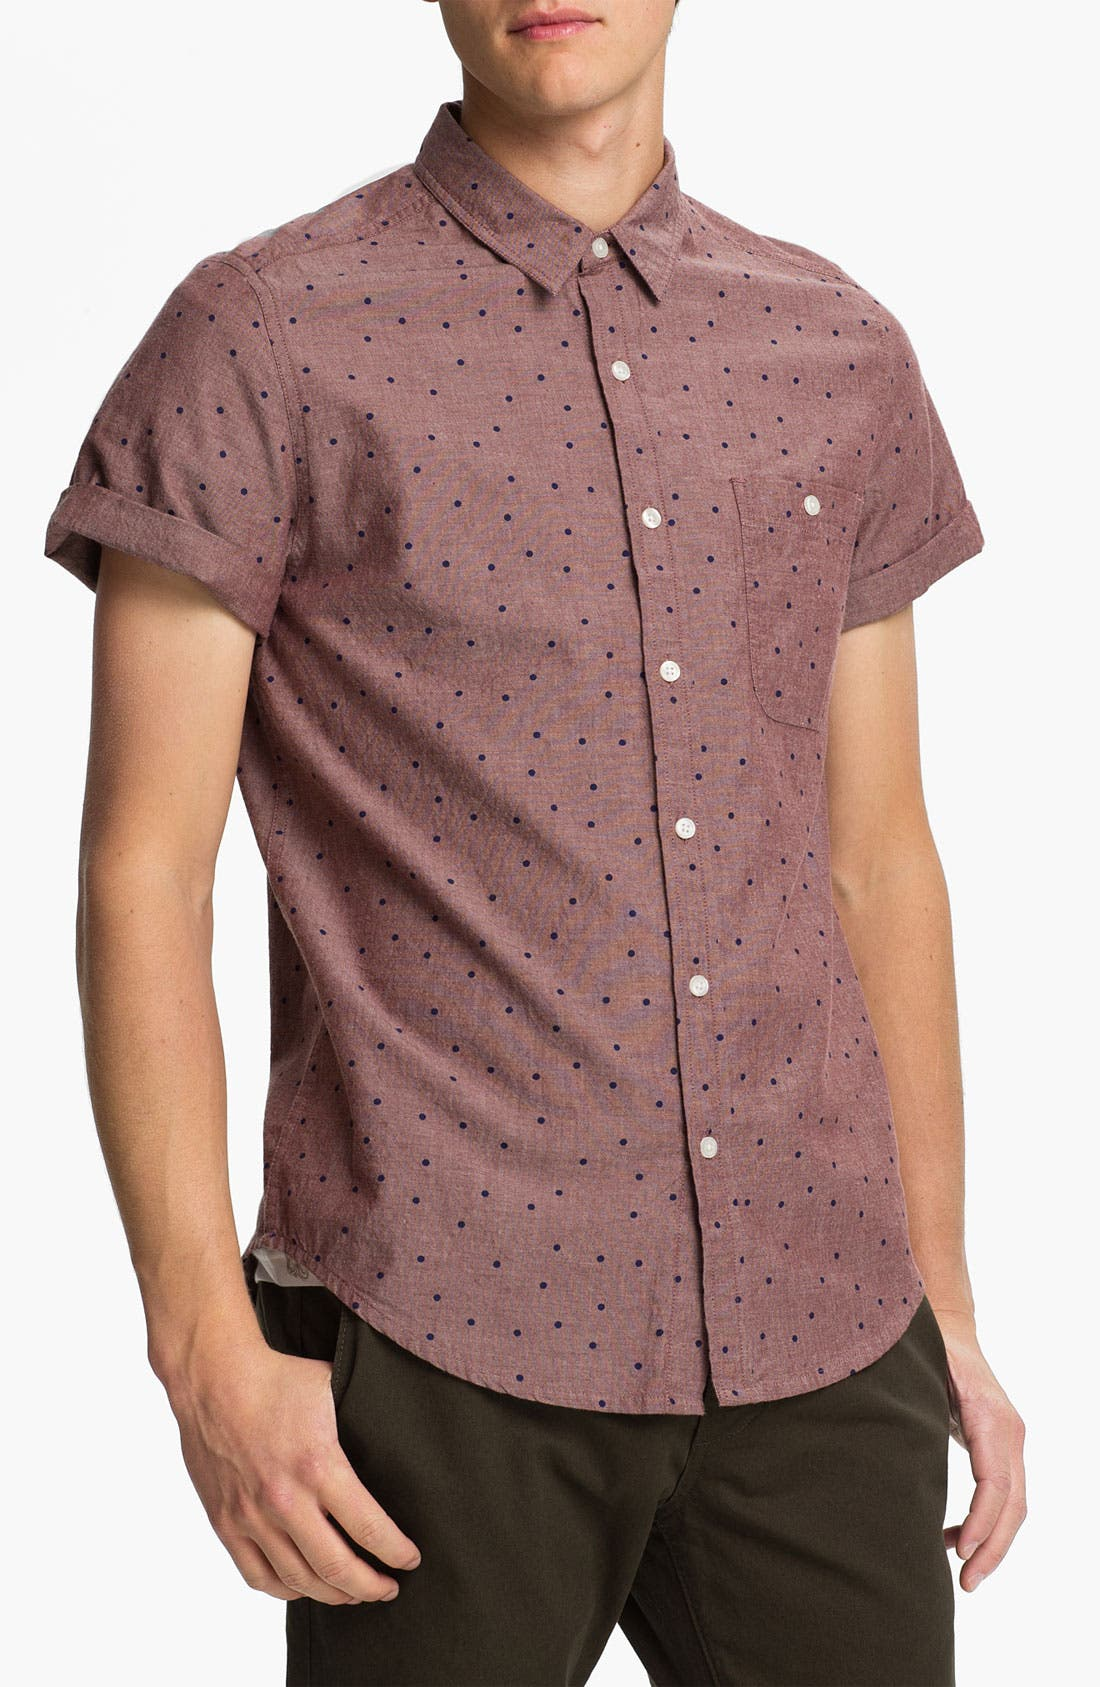 Alternate Image 1 Selected - Topman Polka Dot Woven Shirt